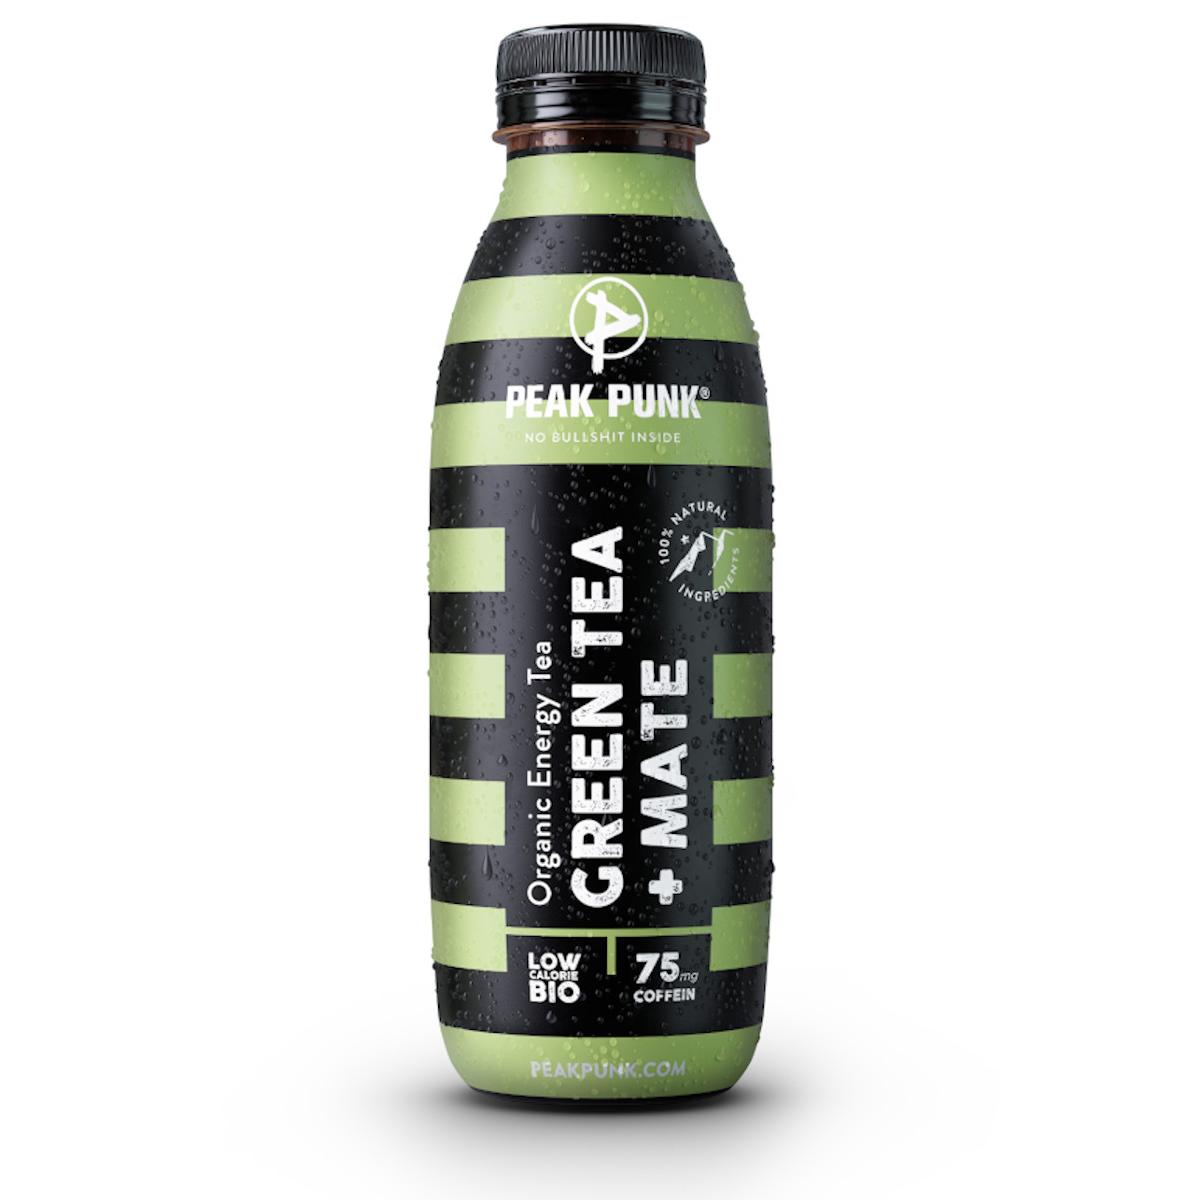 PEAK PUNK Bio Green Tea & Mate